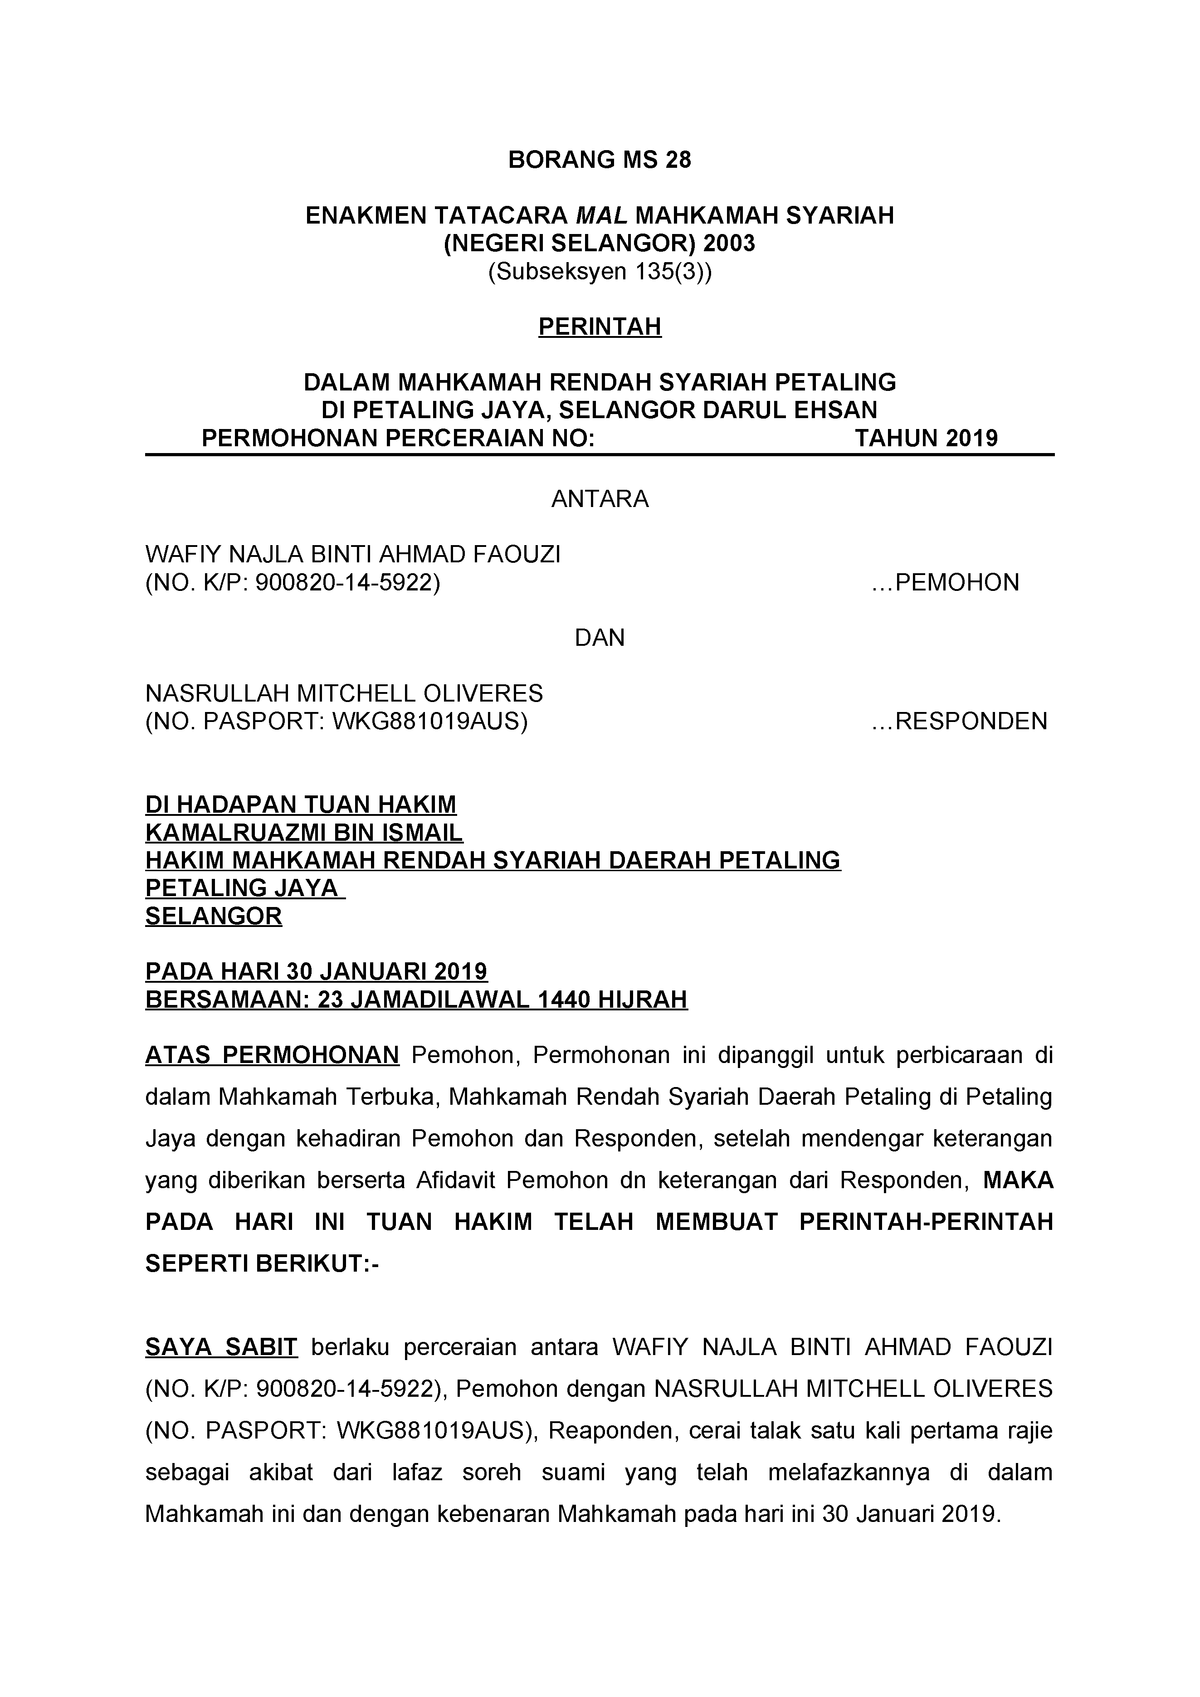 Contoh Surat Permohonan Cerai Talak Gudang Surat